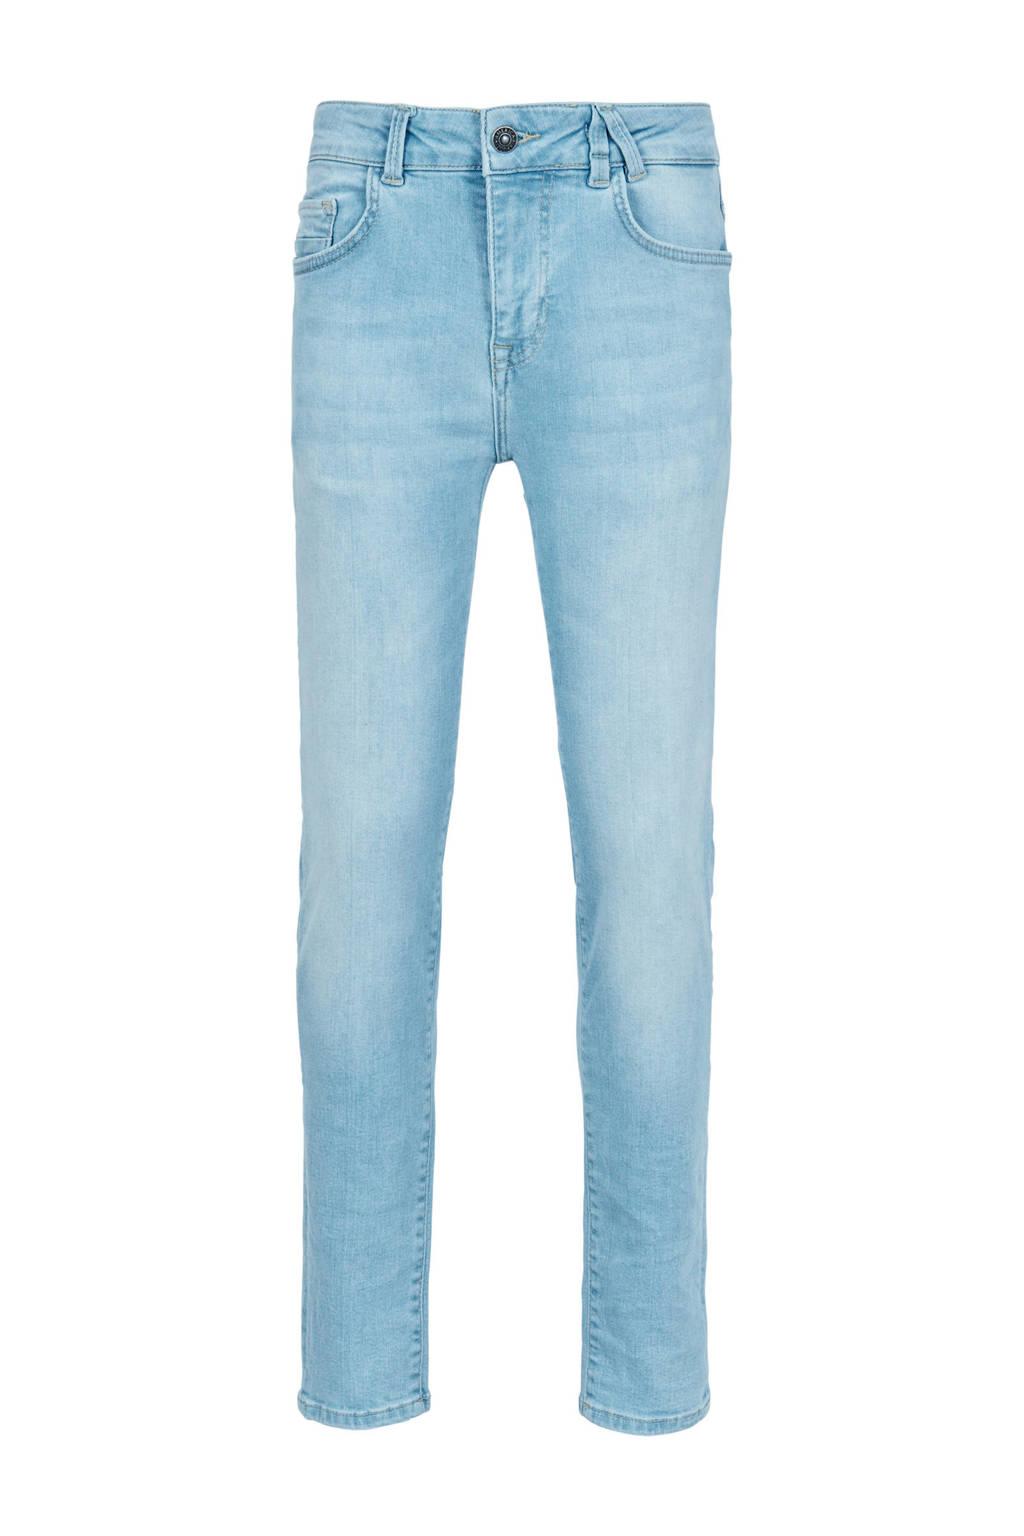 America Today Junior slim fit jeans Kid light denim, Light denim